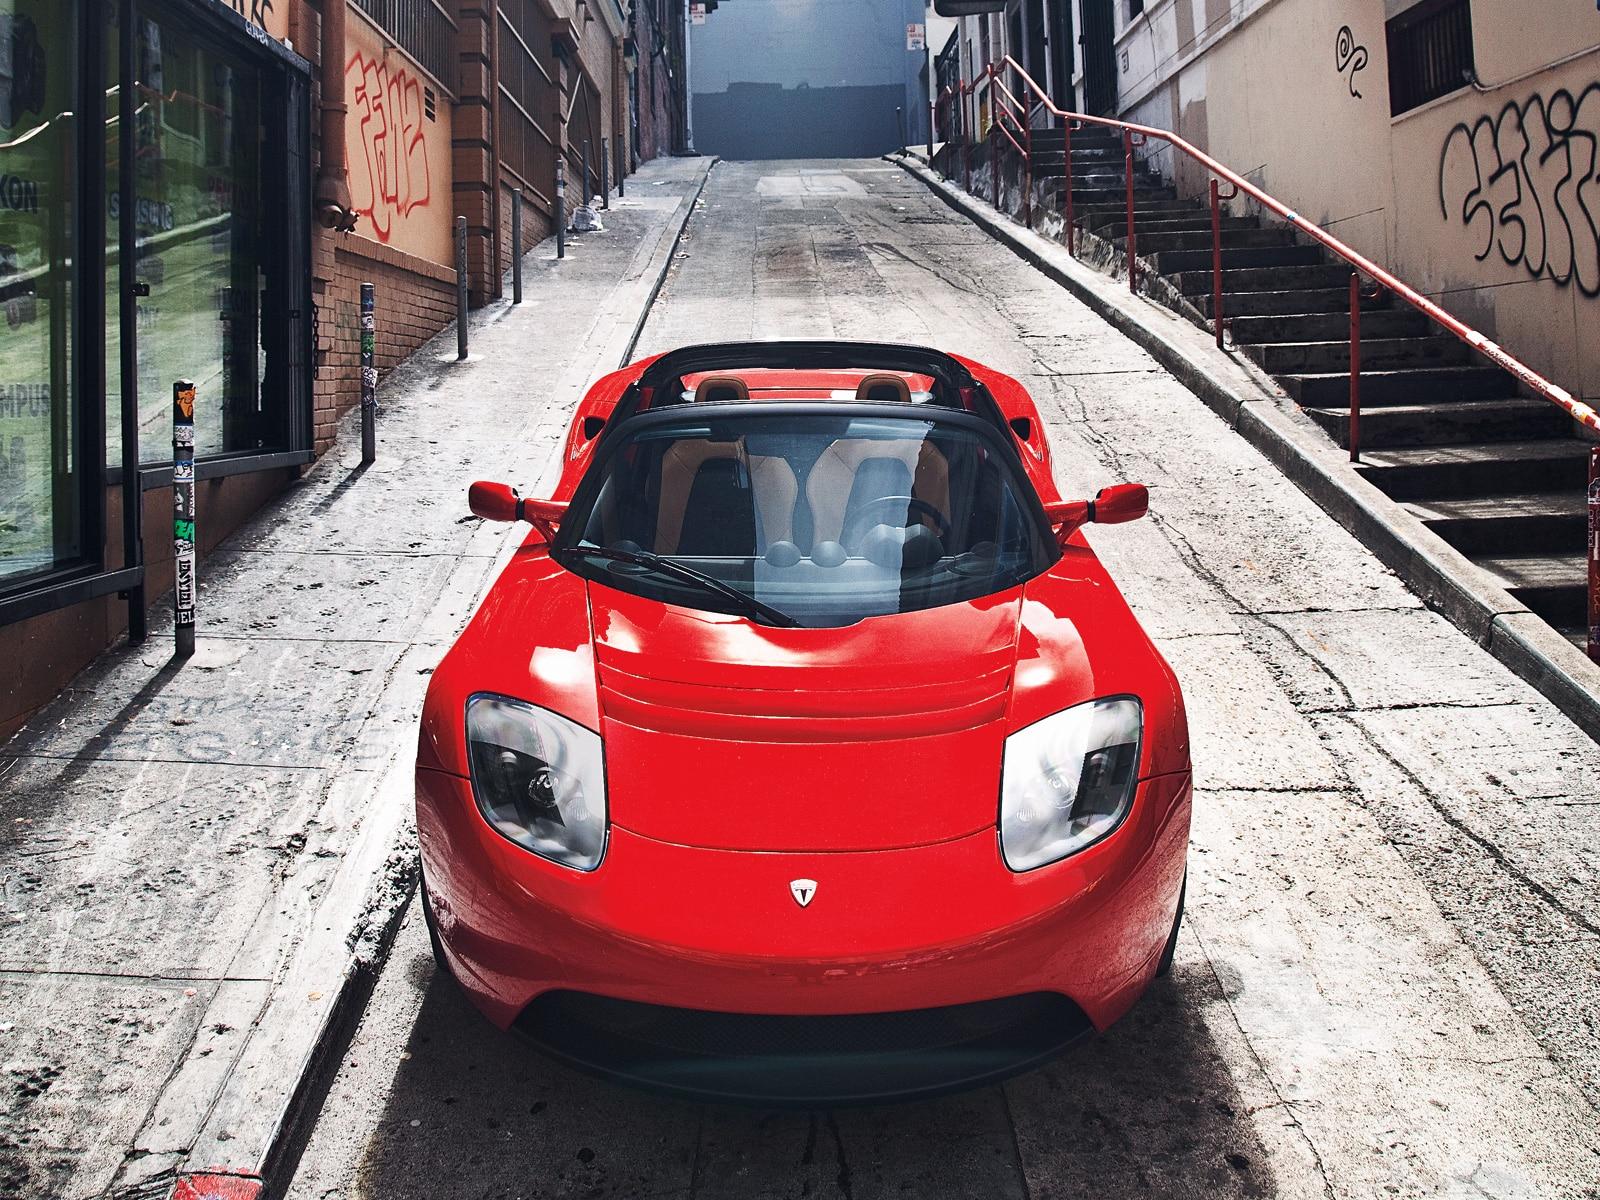 0911 01 Z 2009 Tesla Roadster Electric Car Front View